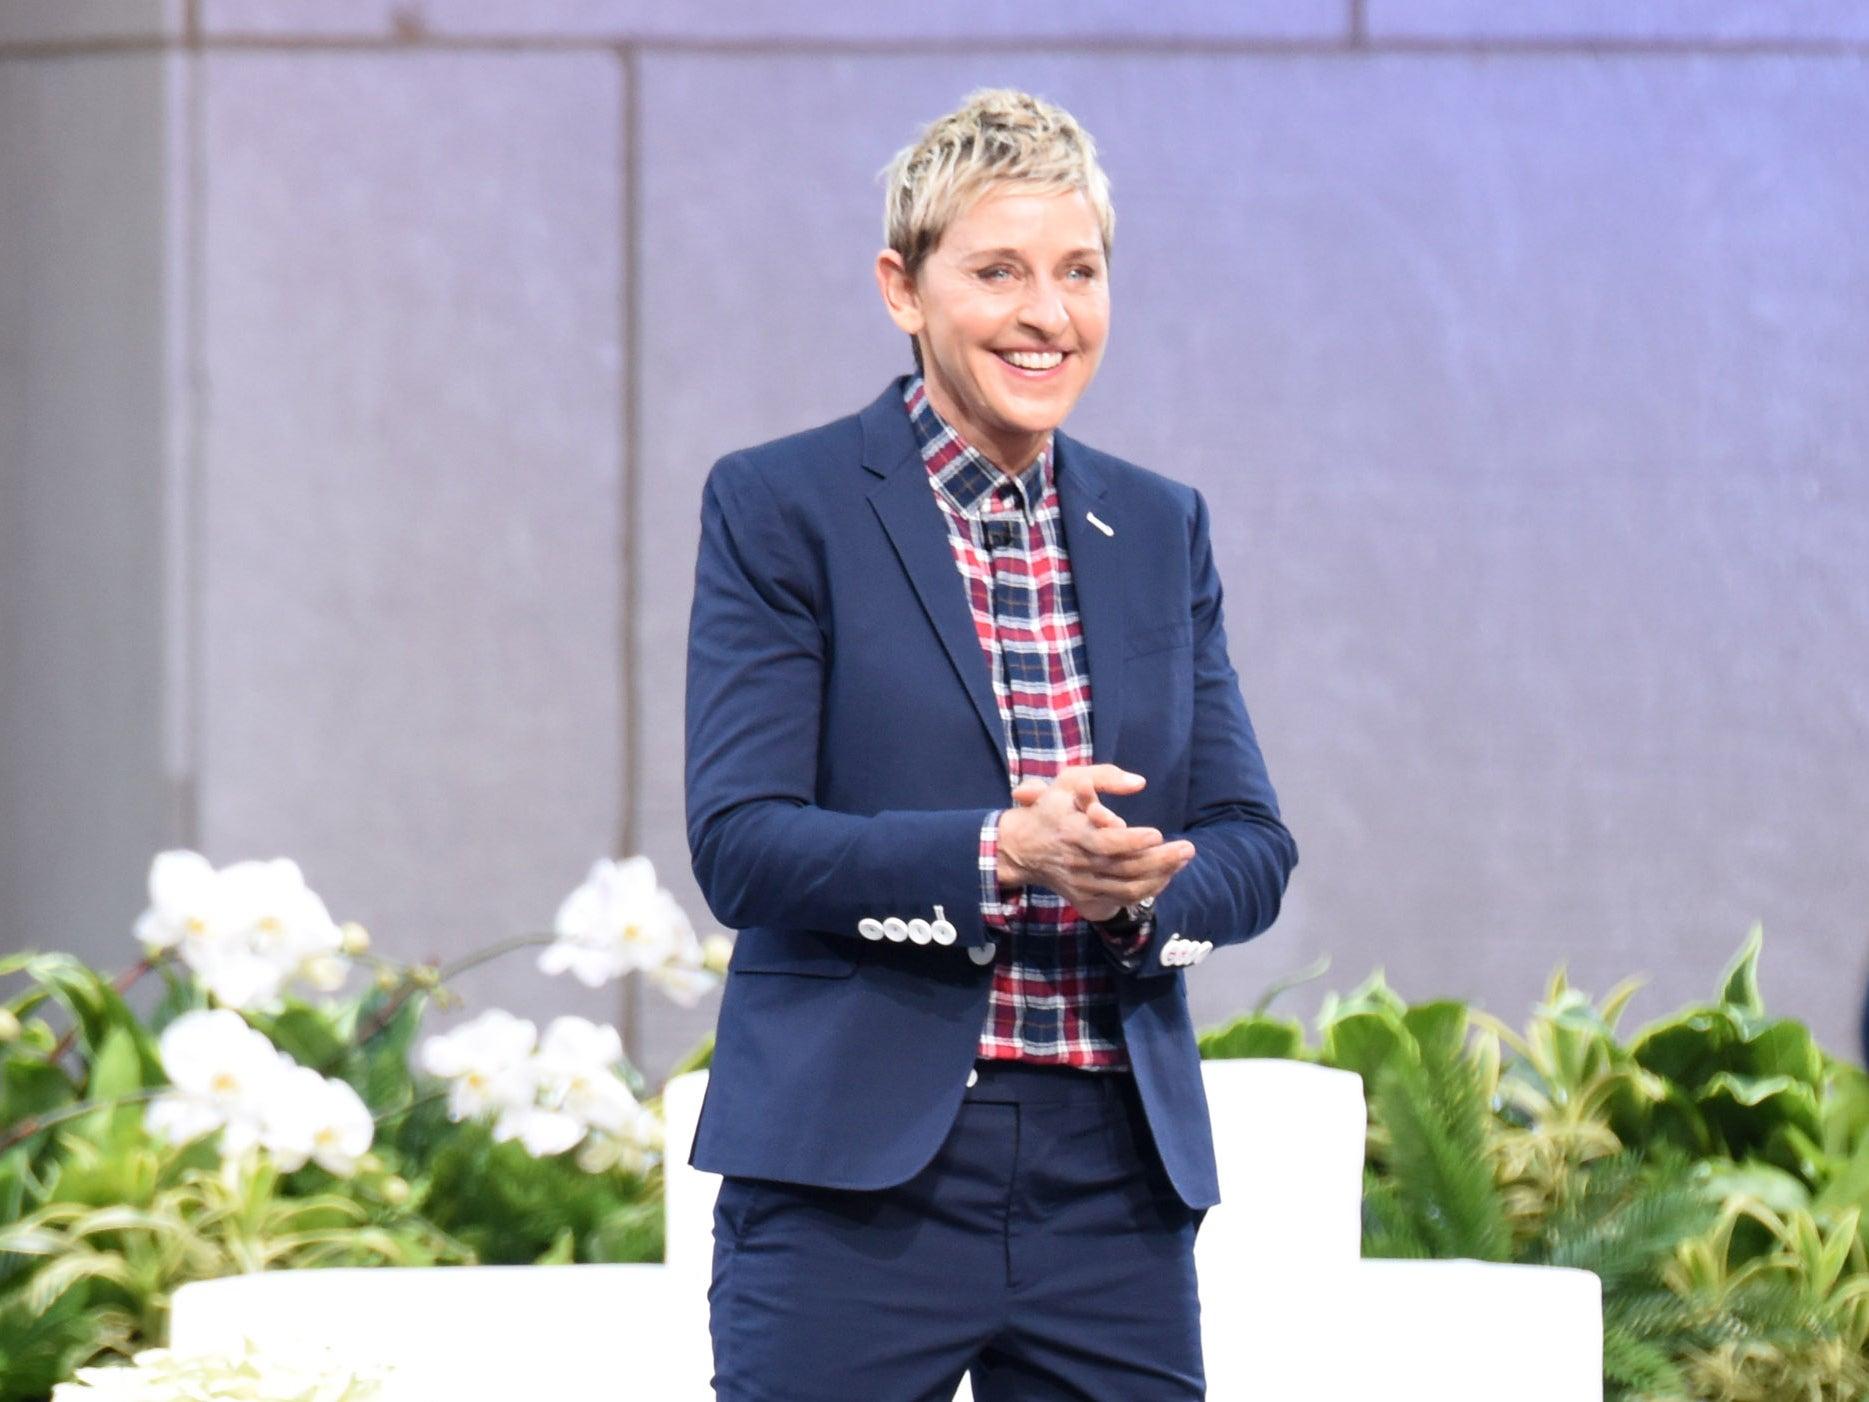 Ellen DeGeneres sued by woman after using her name for breast joke     The Independent Ellen DeGeneres sued by woman after using her name for breast joke   The Independent